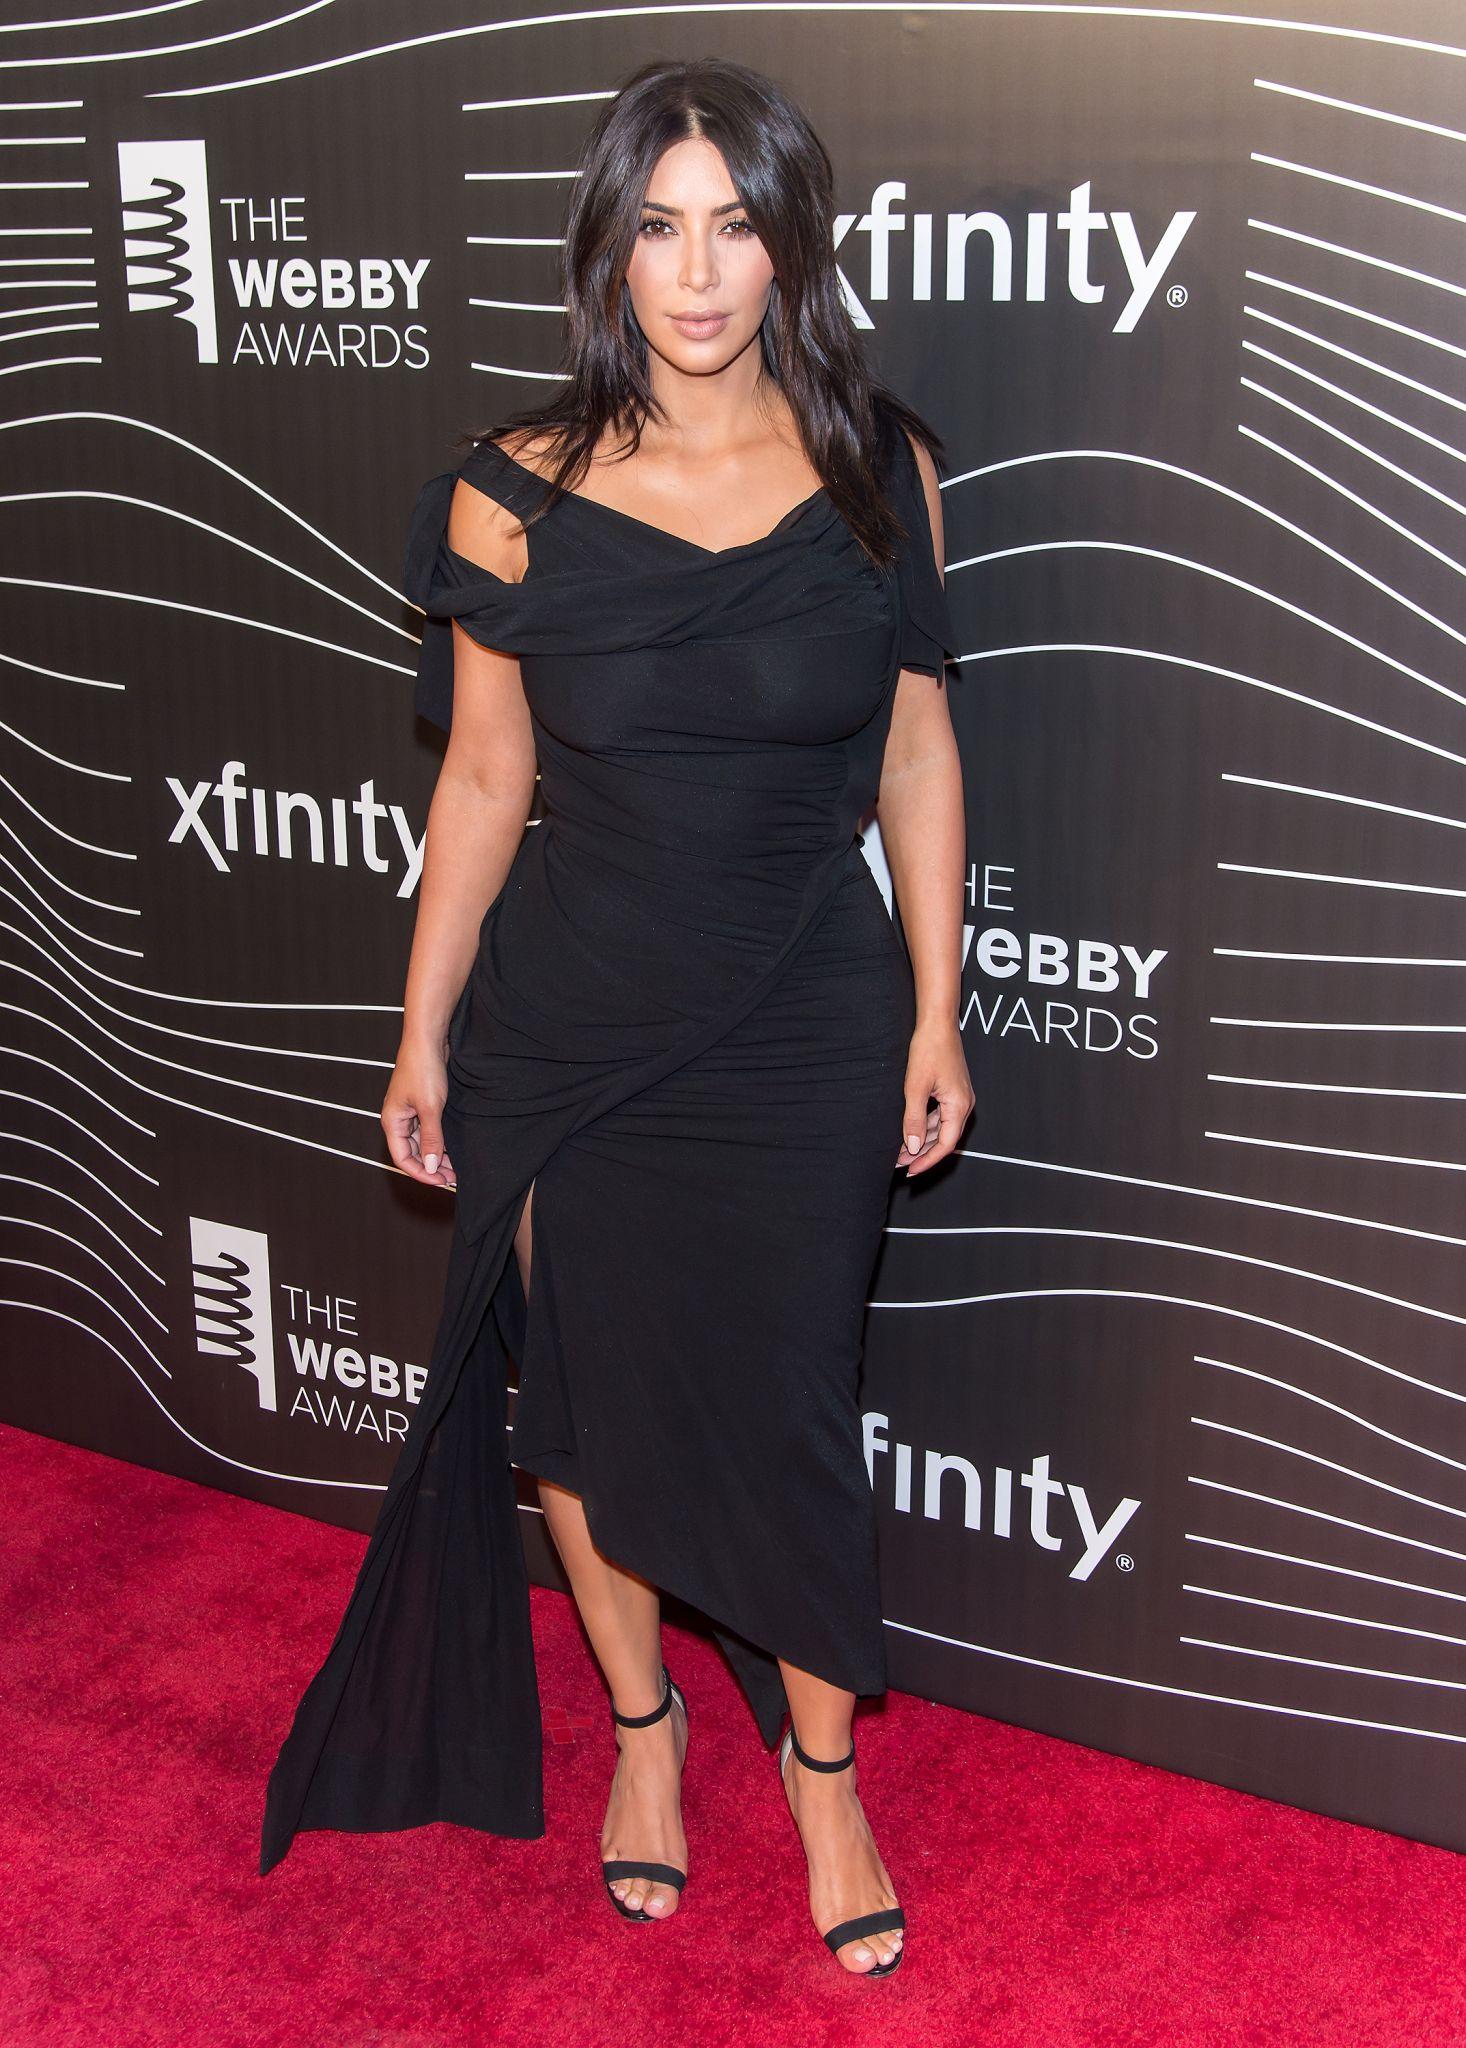 Kim Kardashian vows to continue posting nude selfies